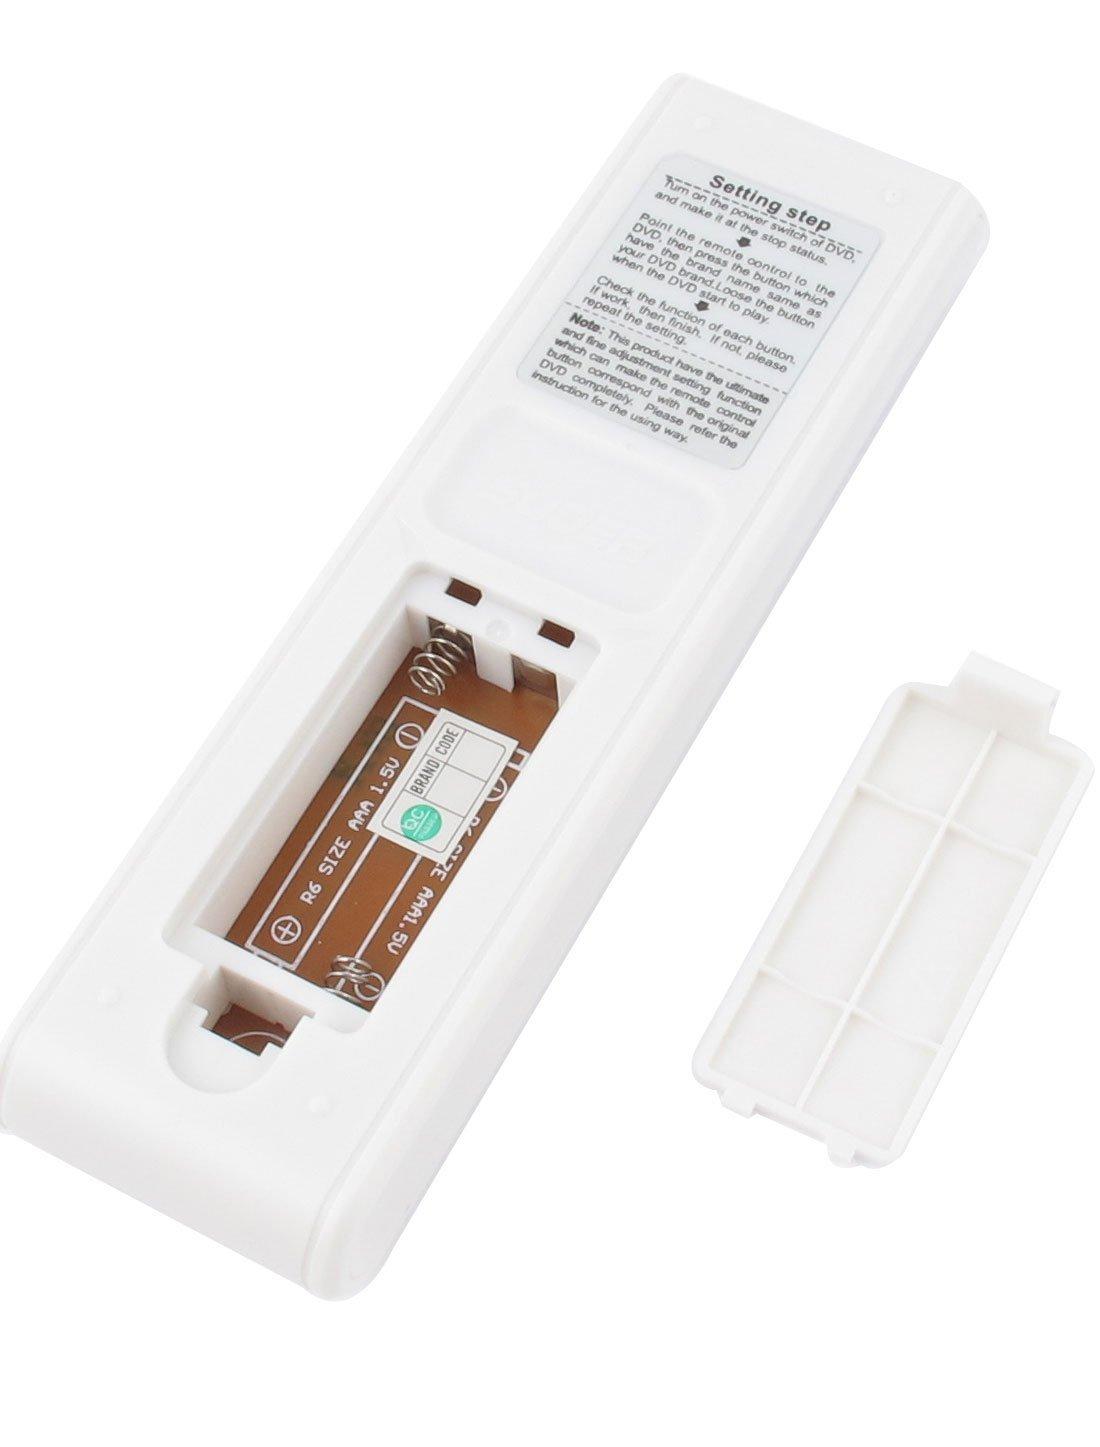 eDealMax SON-290E de plástico Blanco de Shell de la batería de TV Con tecnología de Control remoto Para DVD